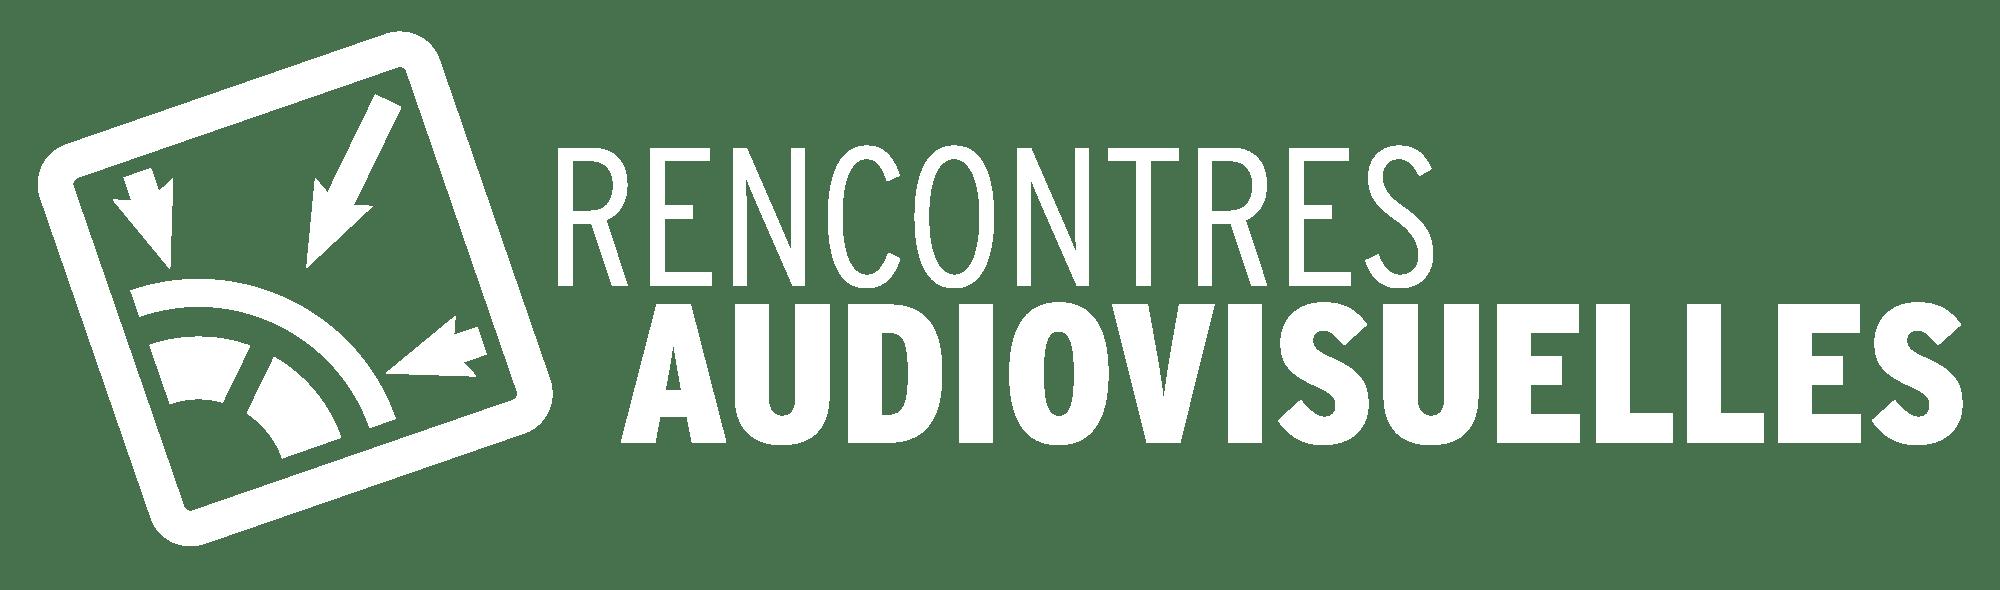 Rencontres Audiovisuelles